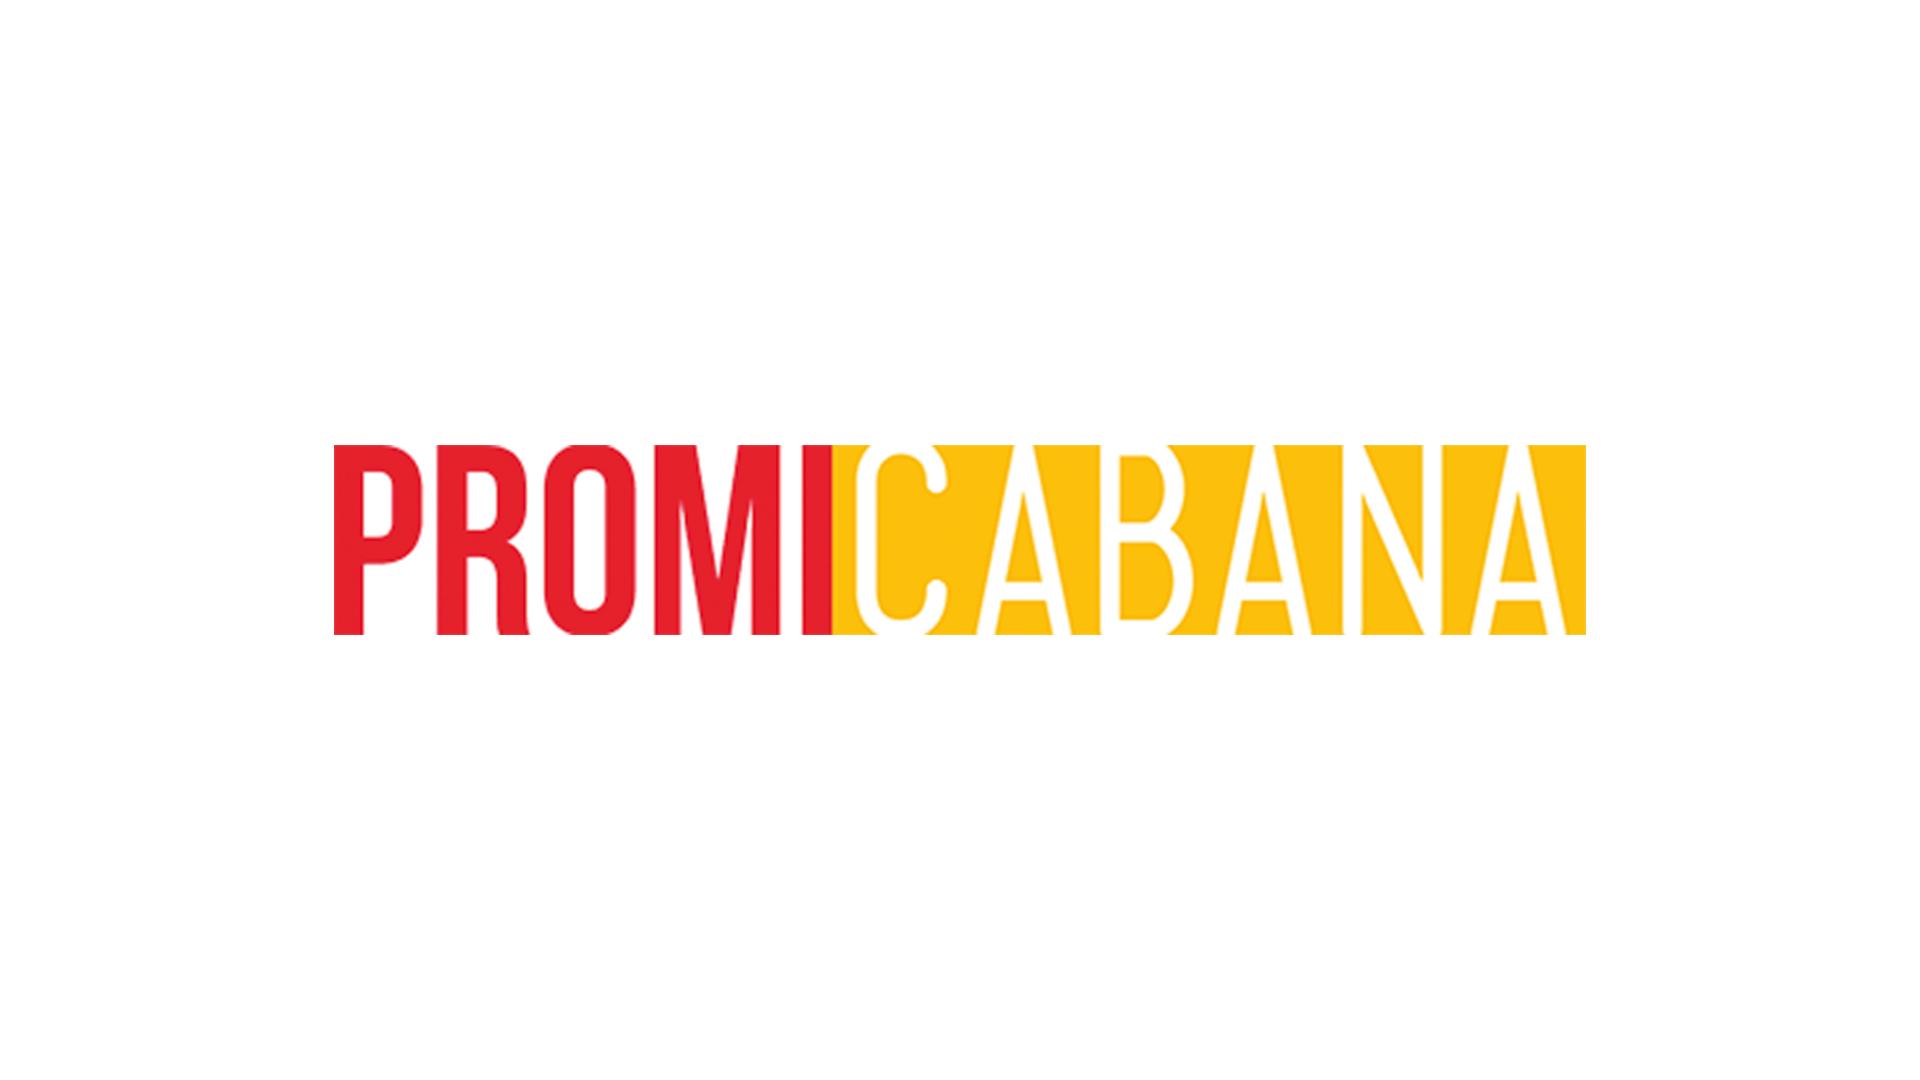 Bruce-Willis-A-Good-Day-to-Die-Hard-Trailer